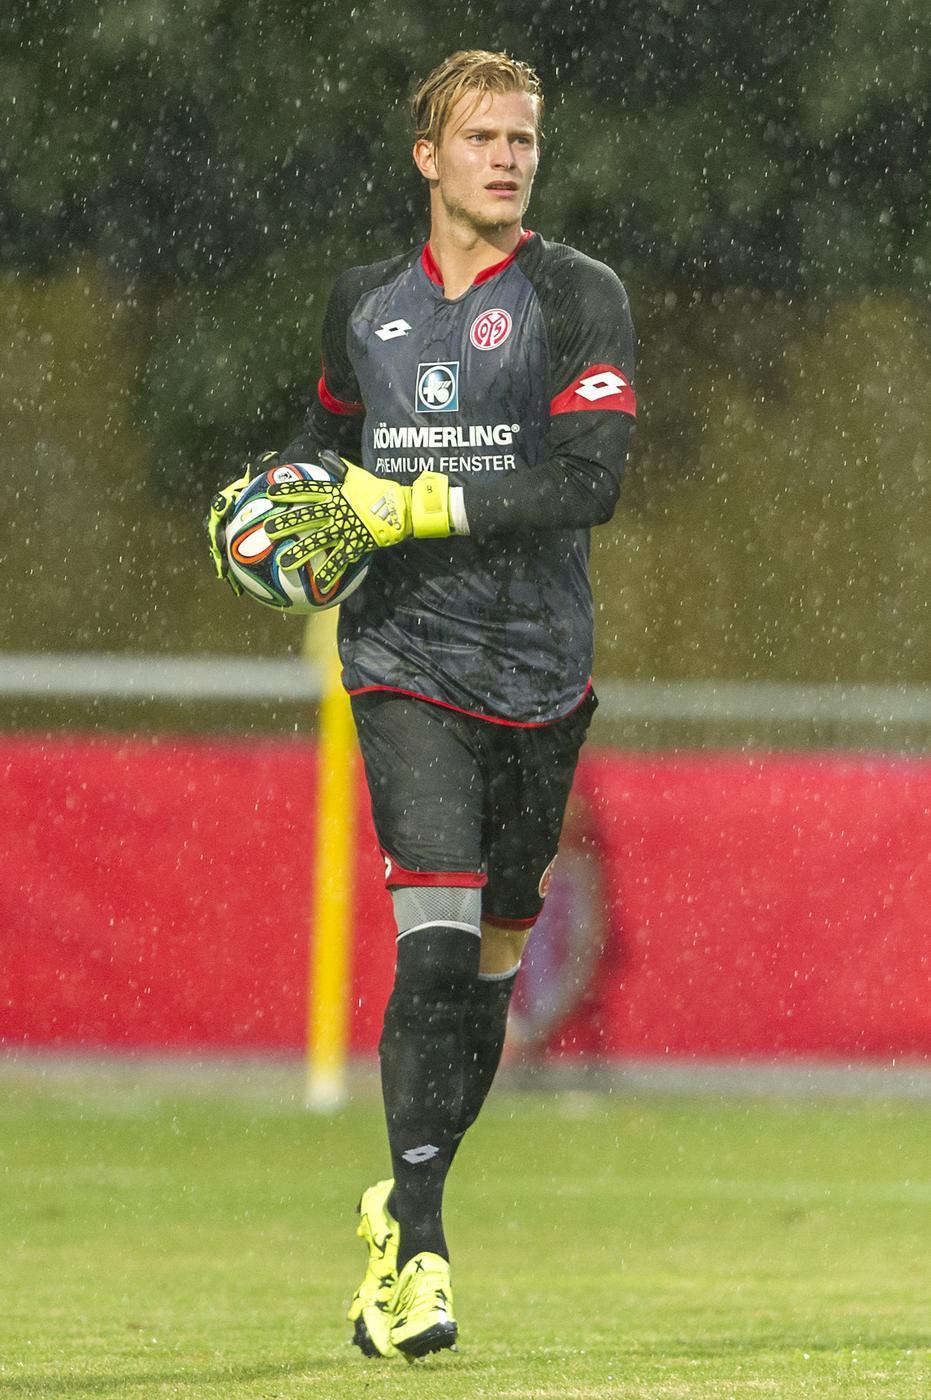 Aston Villa target transfer of Mainz goalkeeper Loris Karius – report